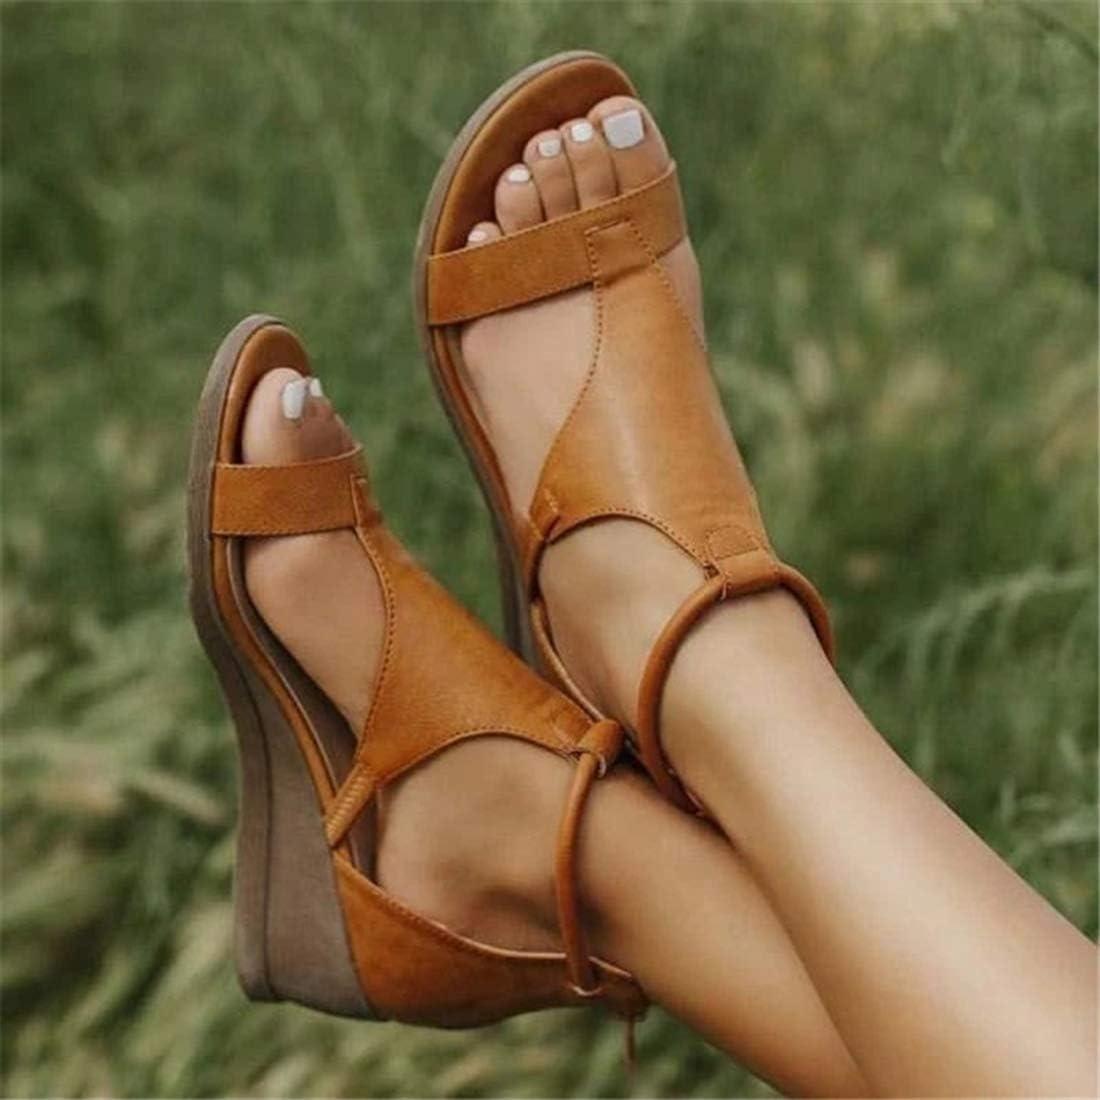 Heflashor Womens Summer Platform Sandals with Zipper Ladies Wedge Sandals Peep Toe Comfy Beach Shoes Brown